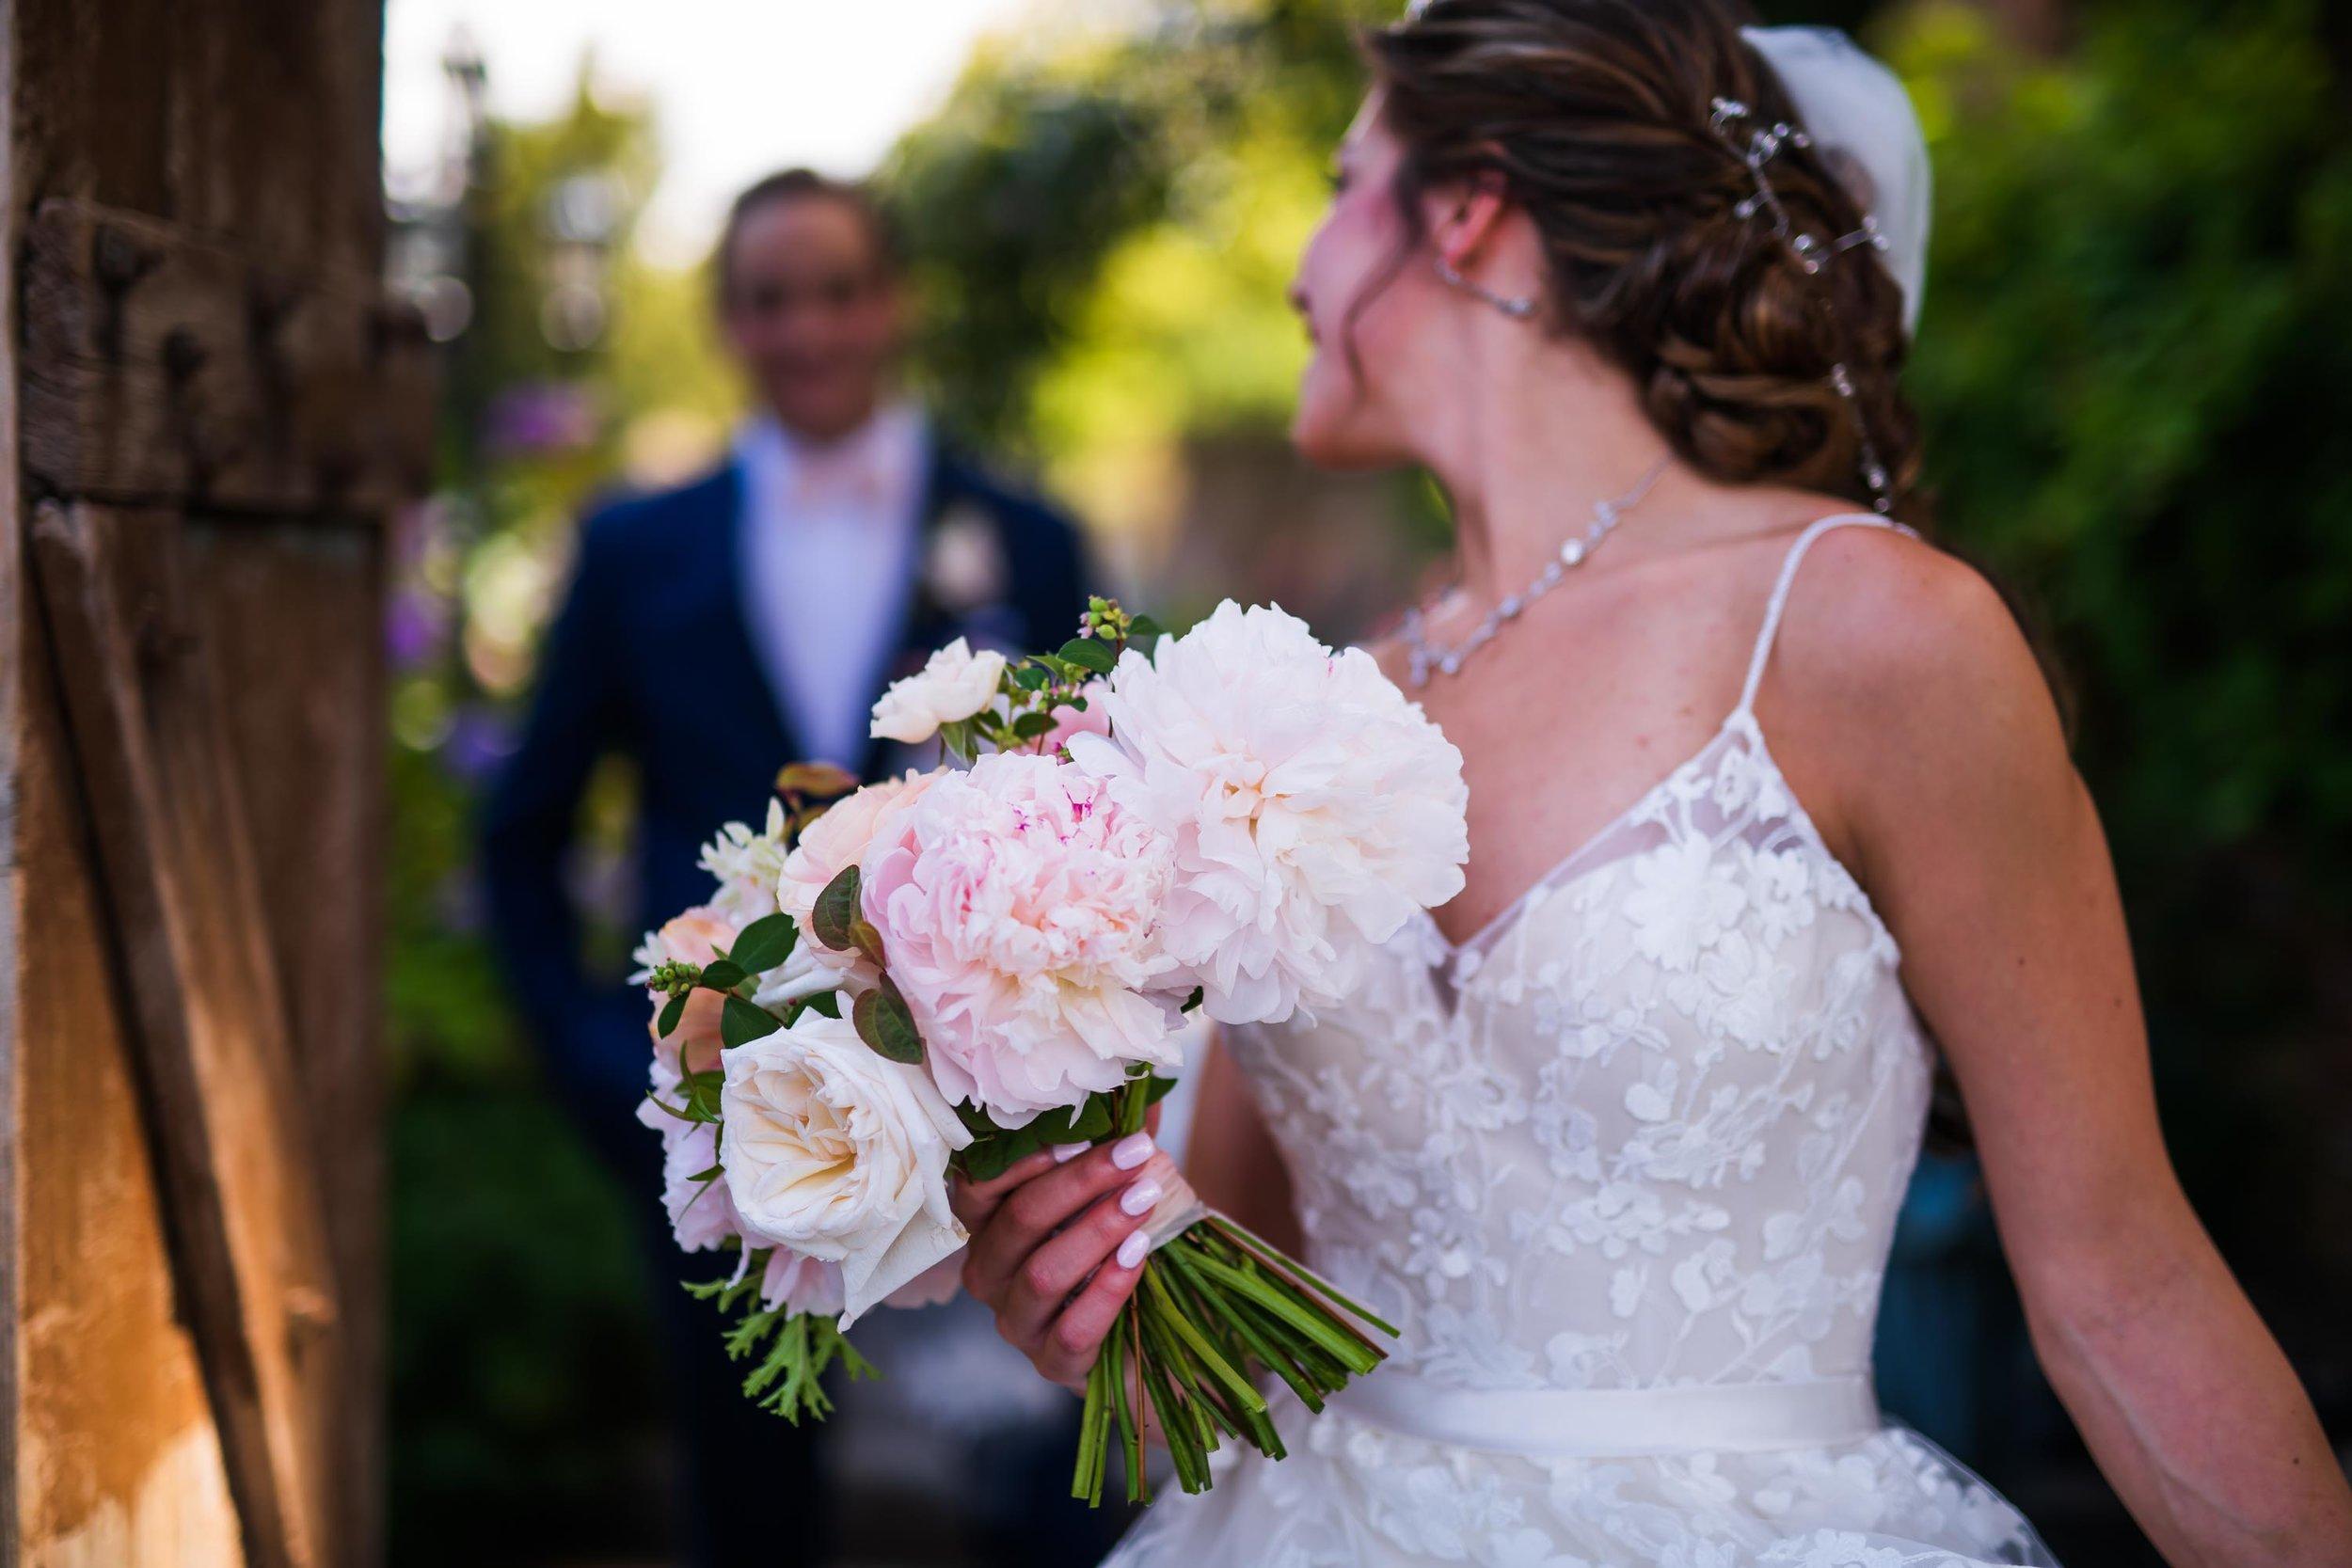 thornewood castle wedding 24.jpg